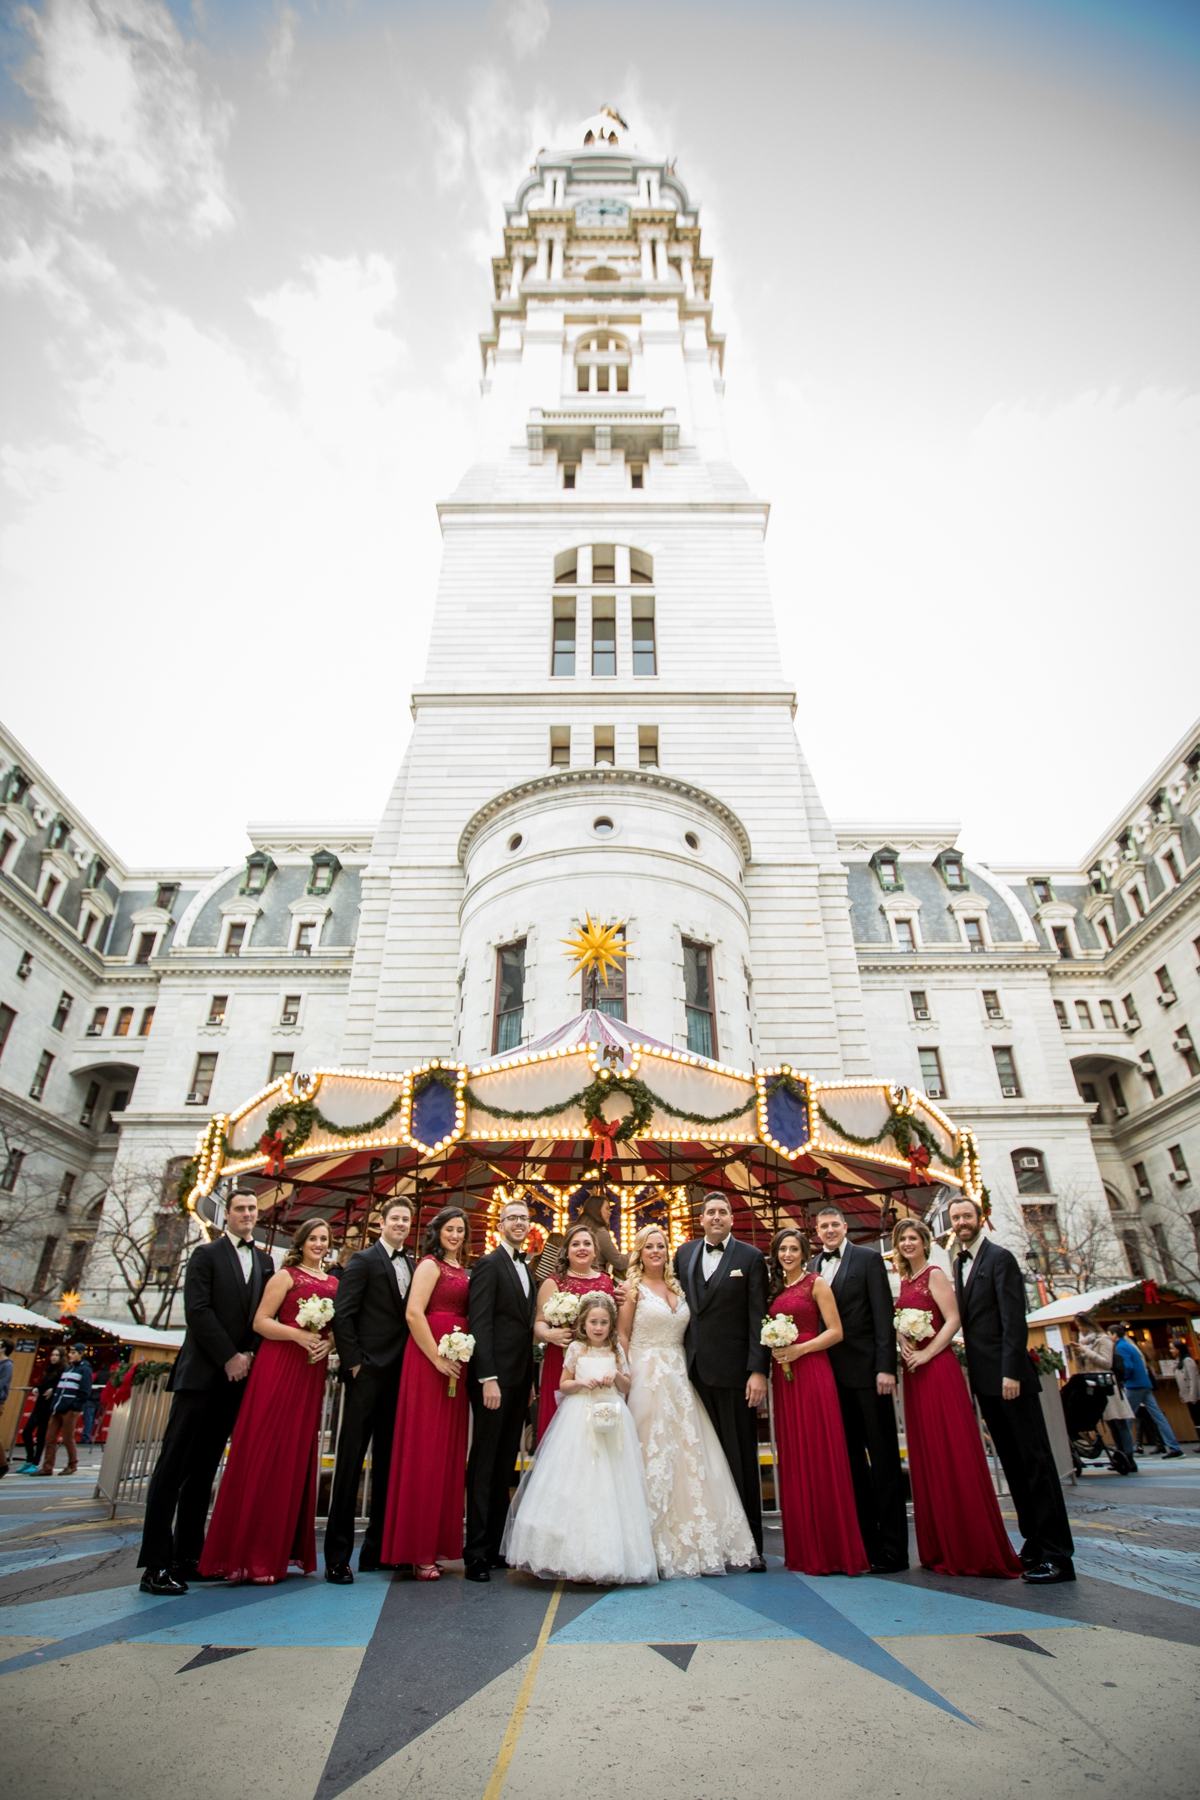 Philadelphia Winter Wedding at Sky Philadelphia | www.aprillynndesigns.com